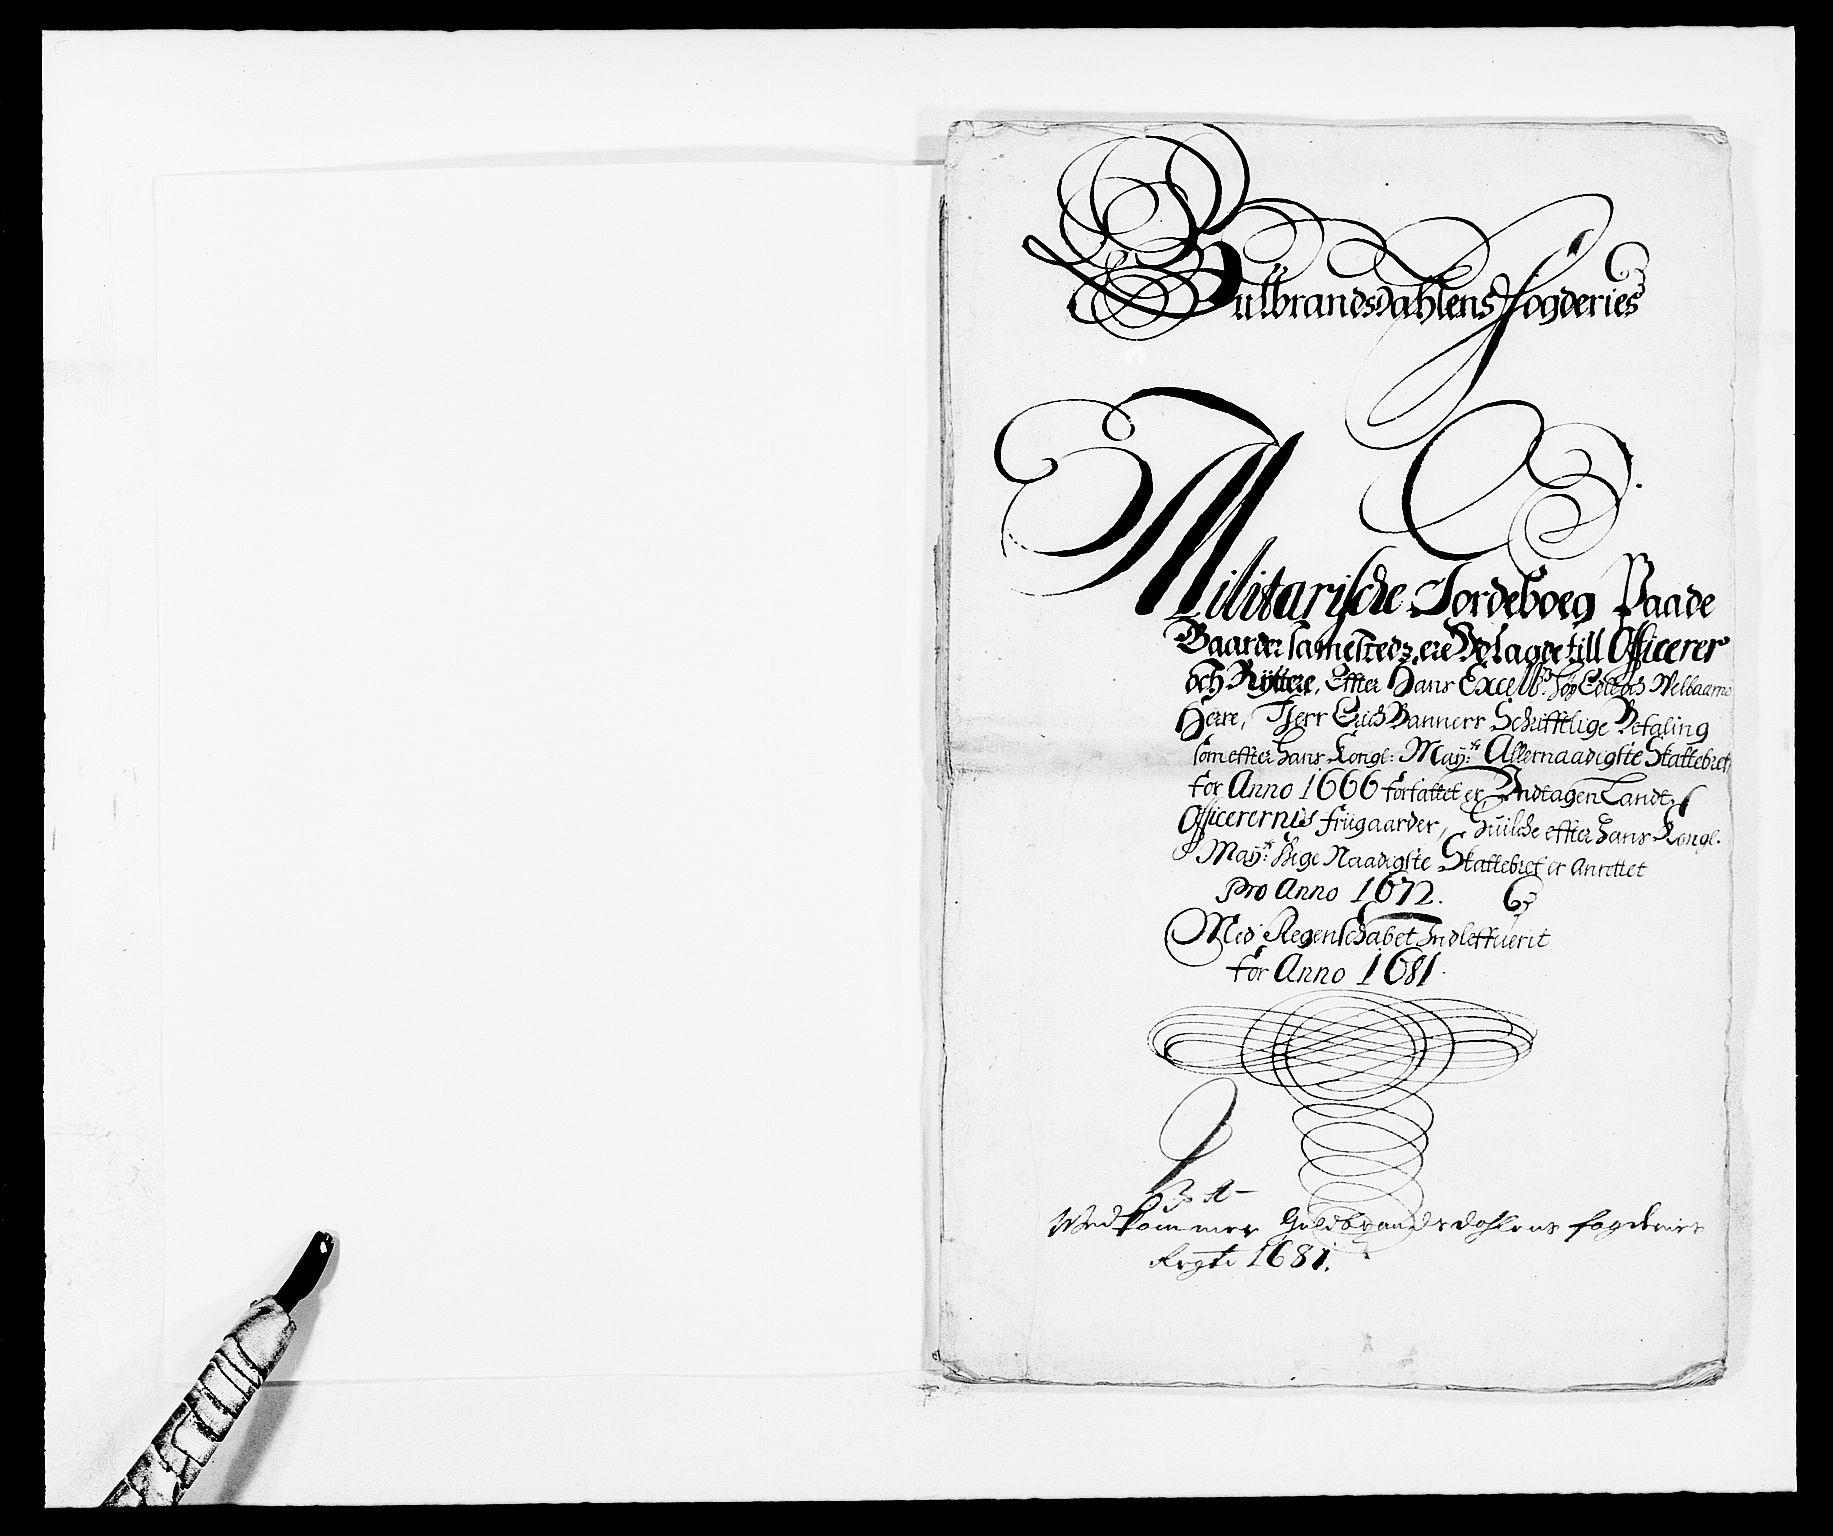 RA, Rentekammeret inntil 1814, Reviderte regnskaper, Fogderegnskap, R17/L1156: Fogderegnskap Gudbrandsdal, 1681, s. 158